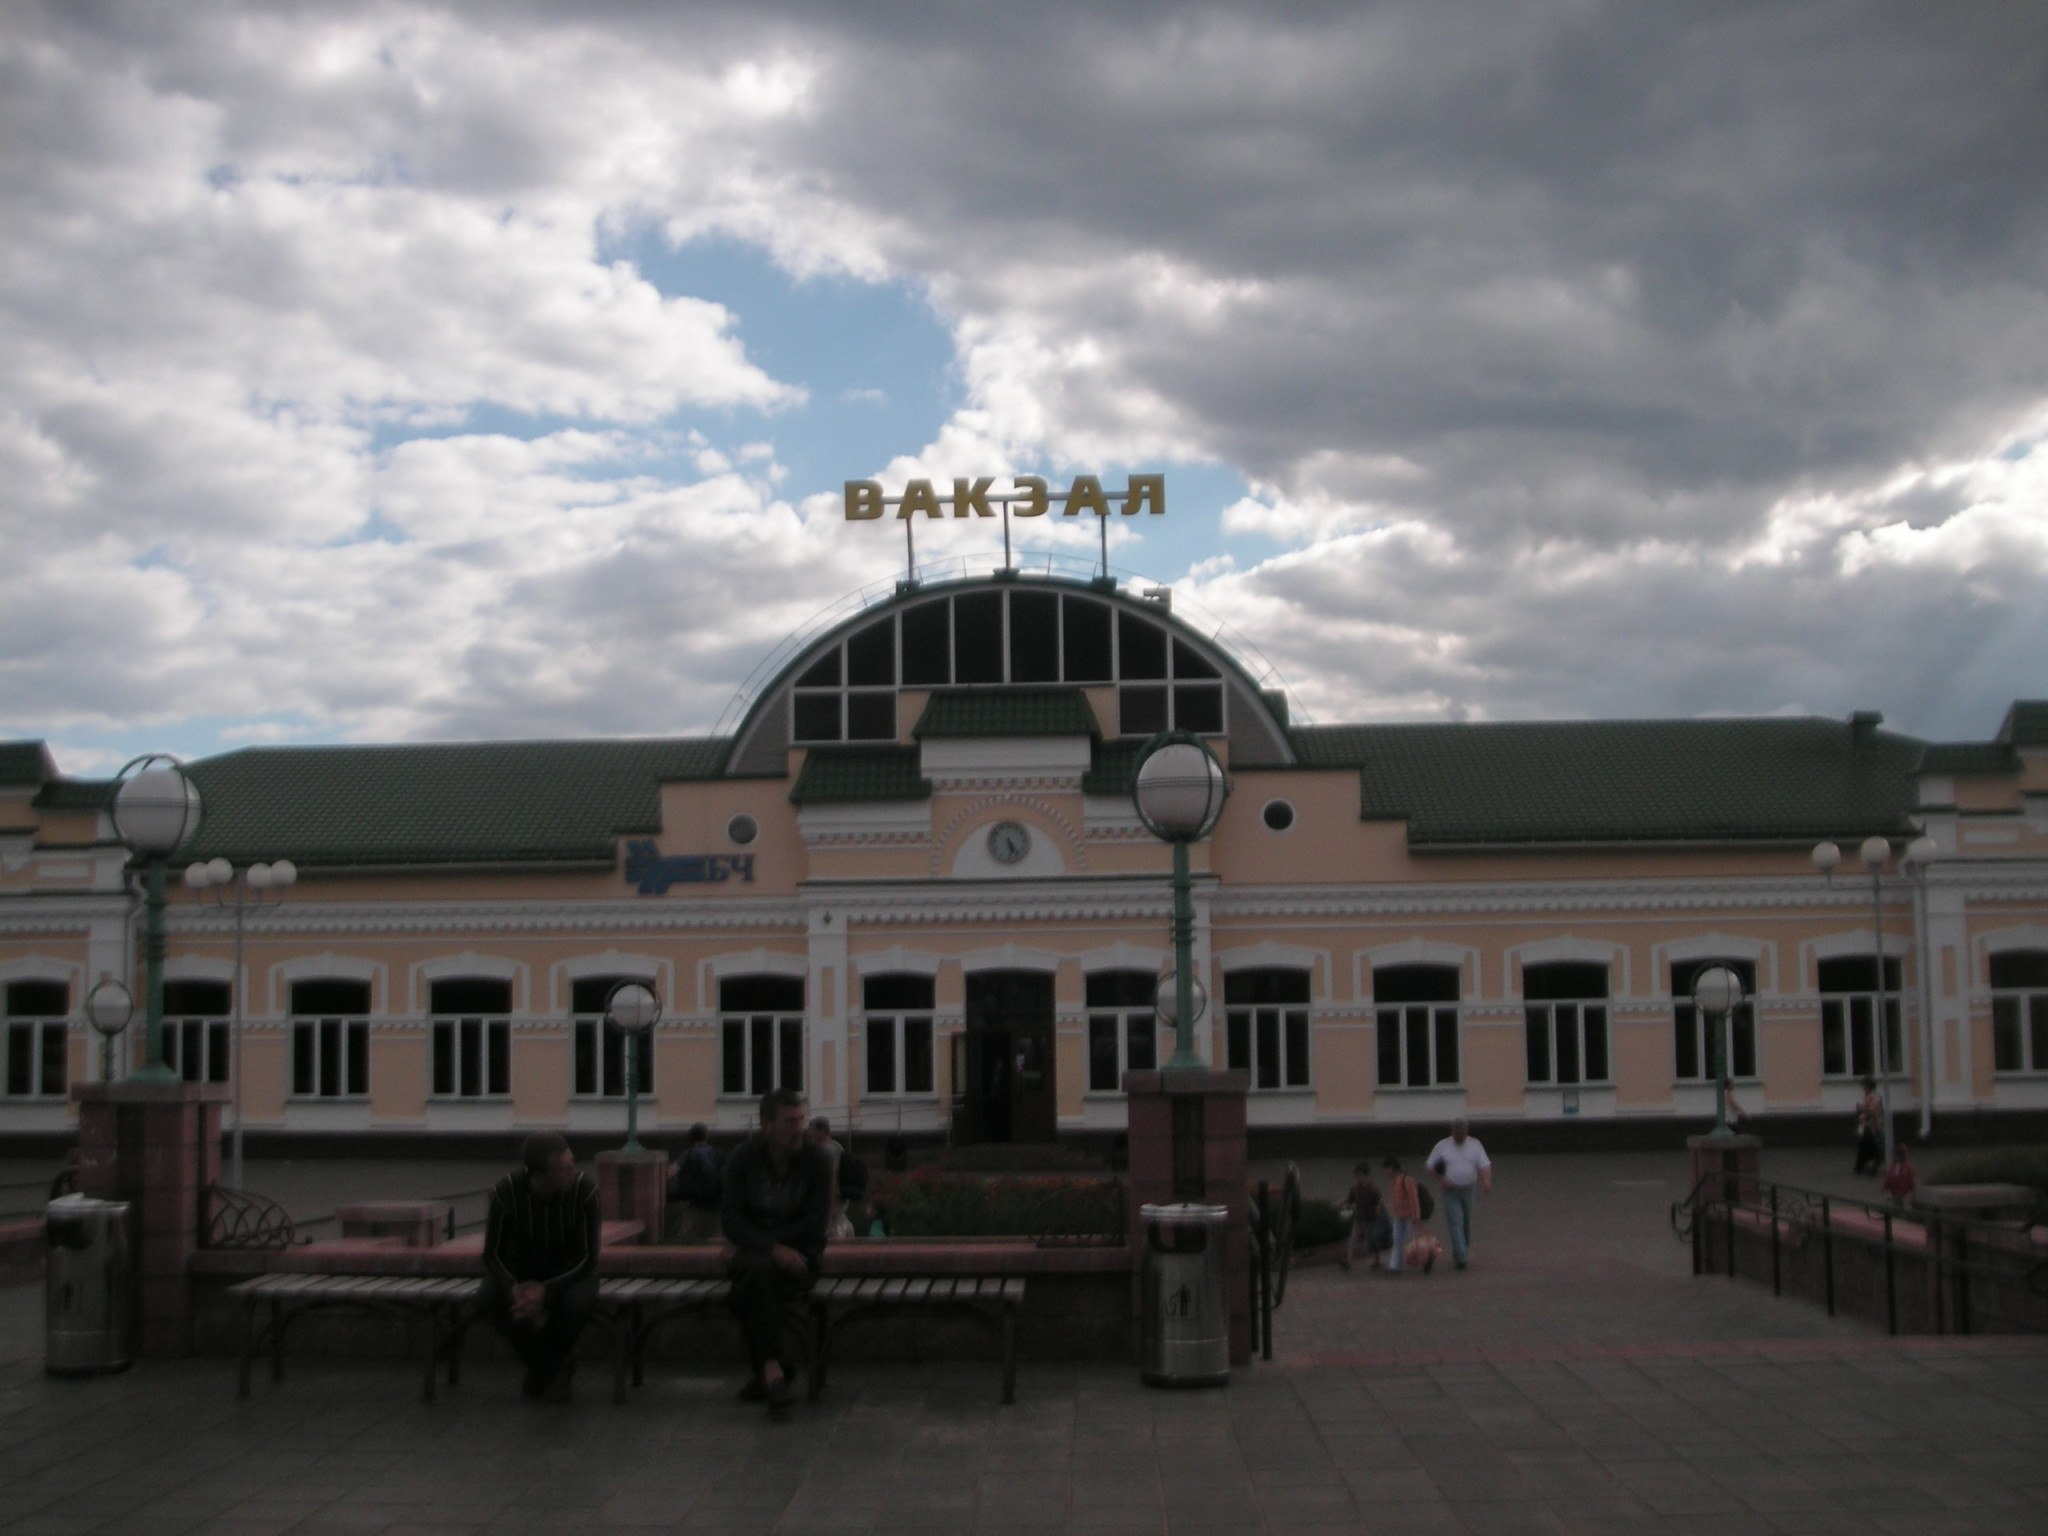 Backpacking in Belarus: Top 5 Sights in Bobruisk